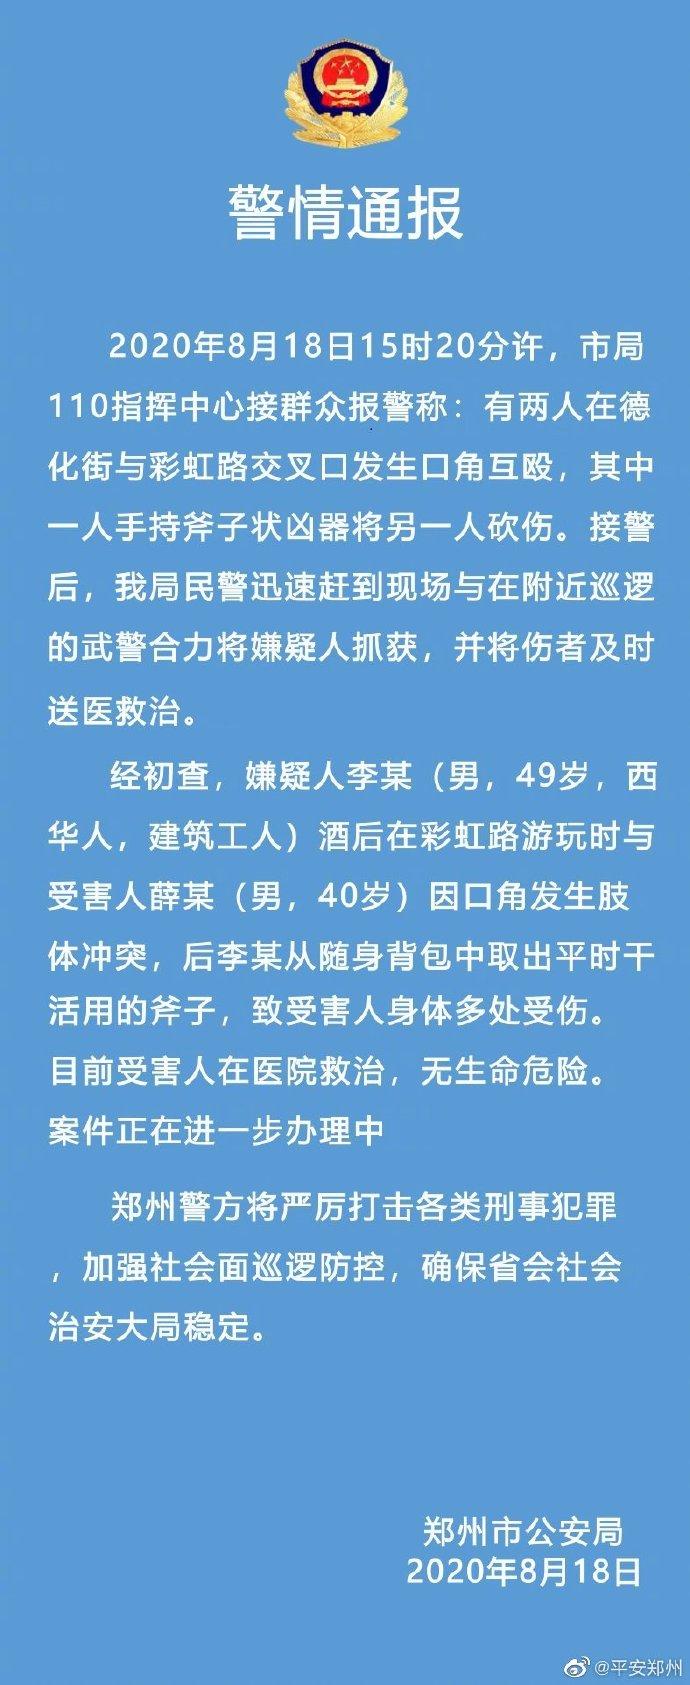 【google图片搜索引擎】_郑州一男子广场持斧砍人被制服 警方通报详情